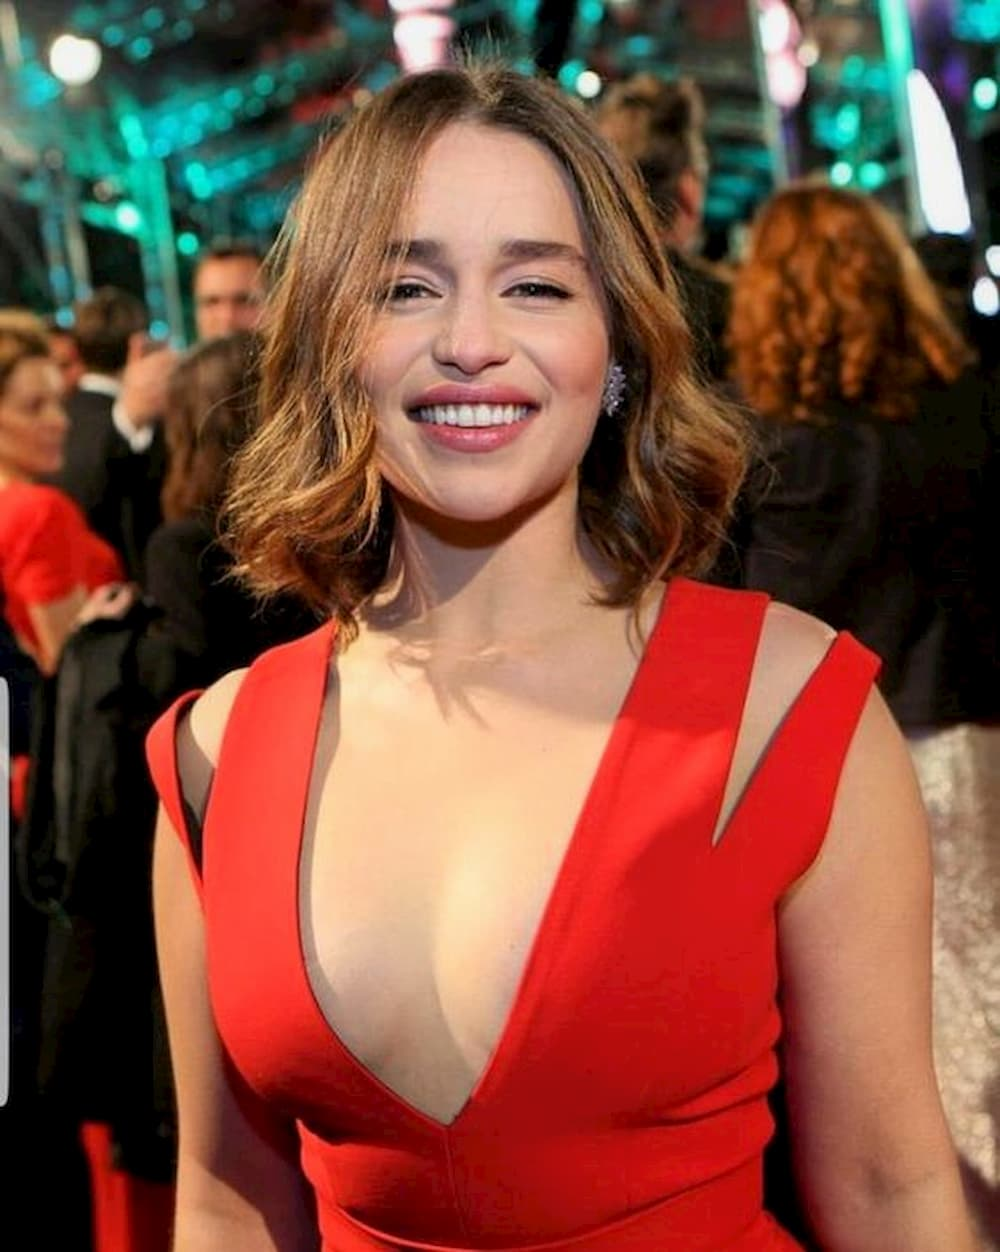 Emilia Clarke Measurements Height Weight Bra Size Age Wiki